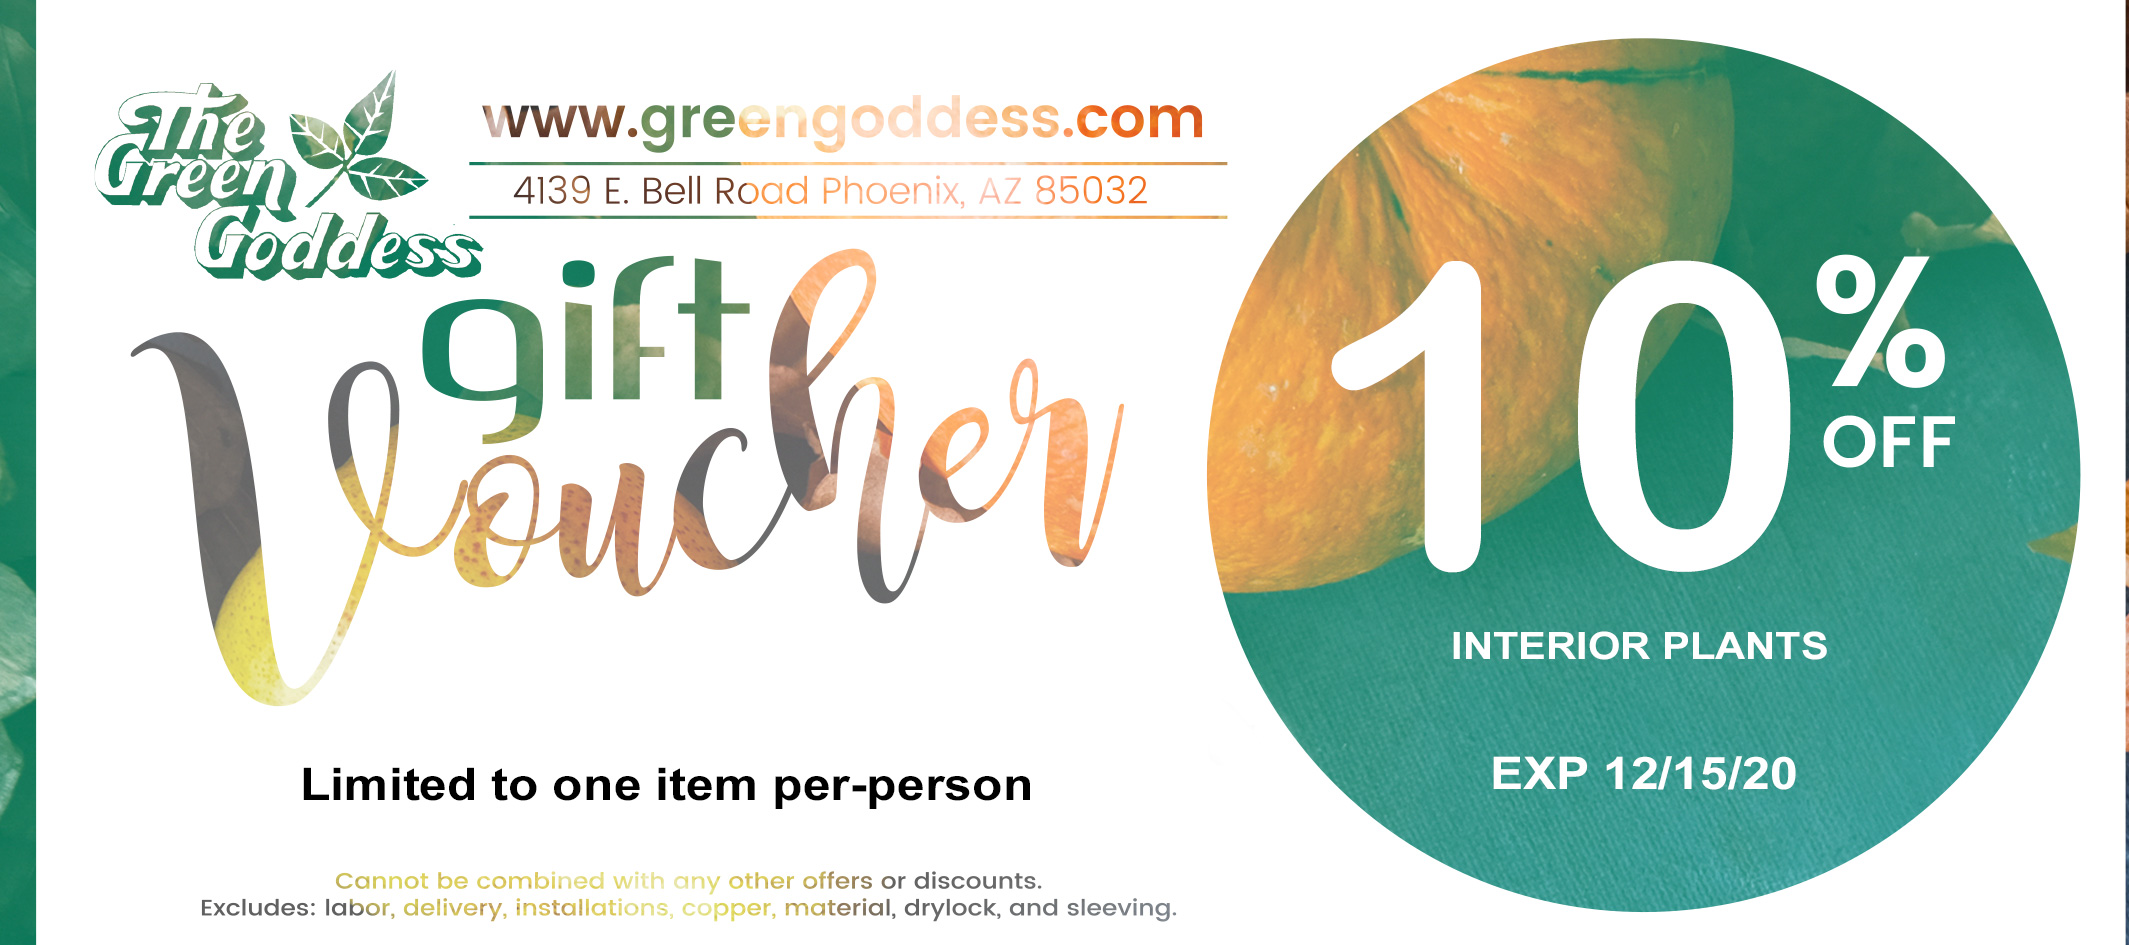 The Green Goddess November Coupon